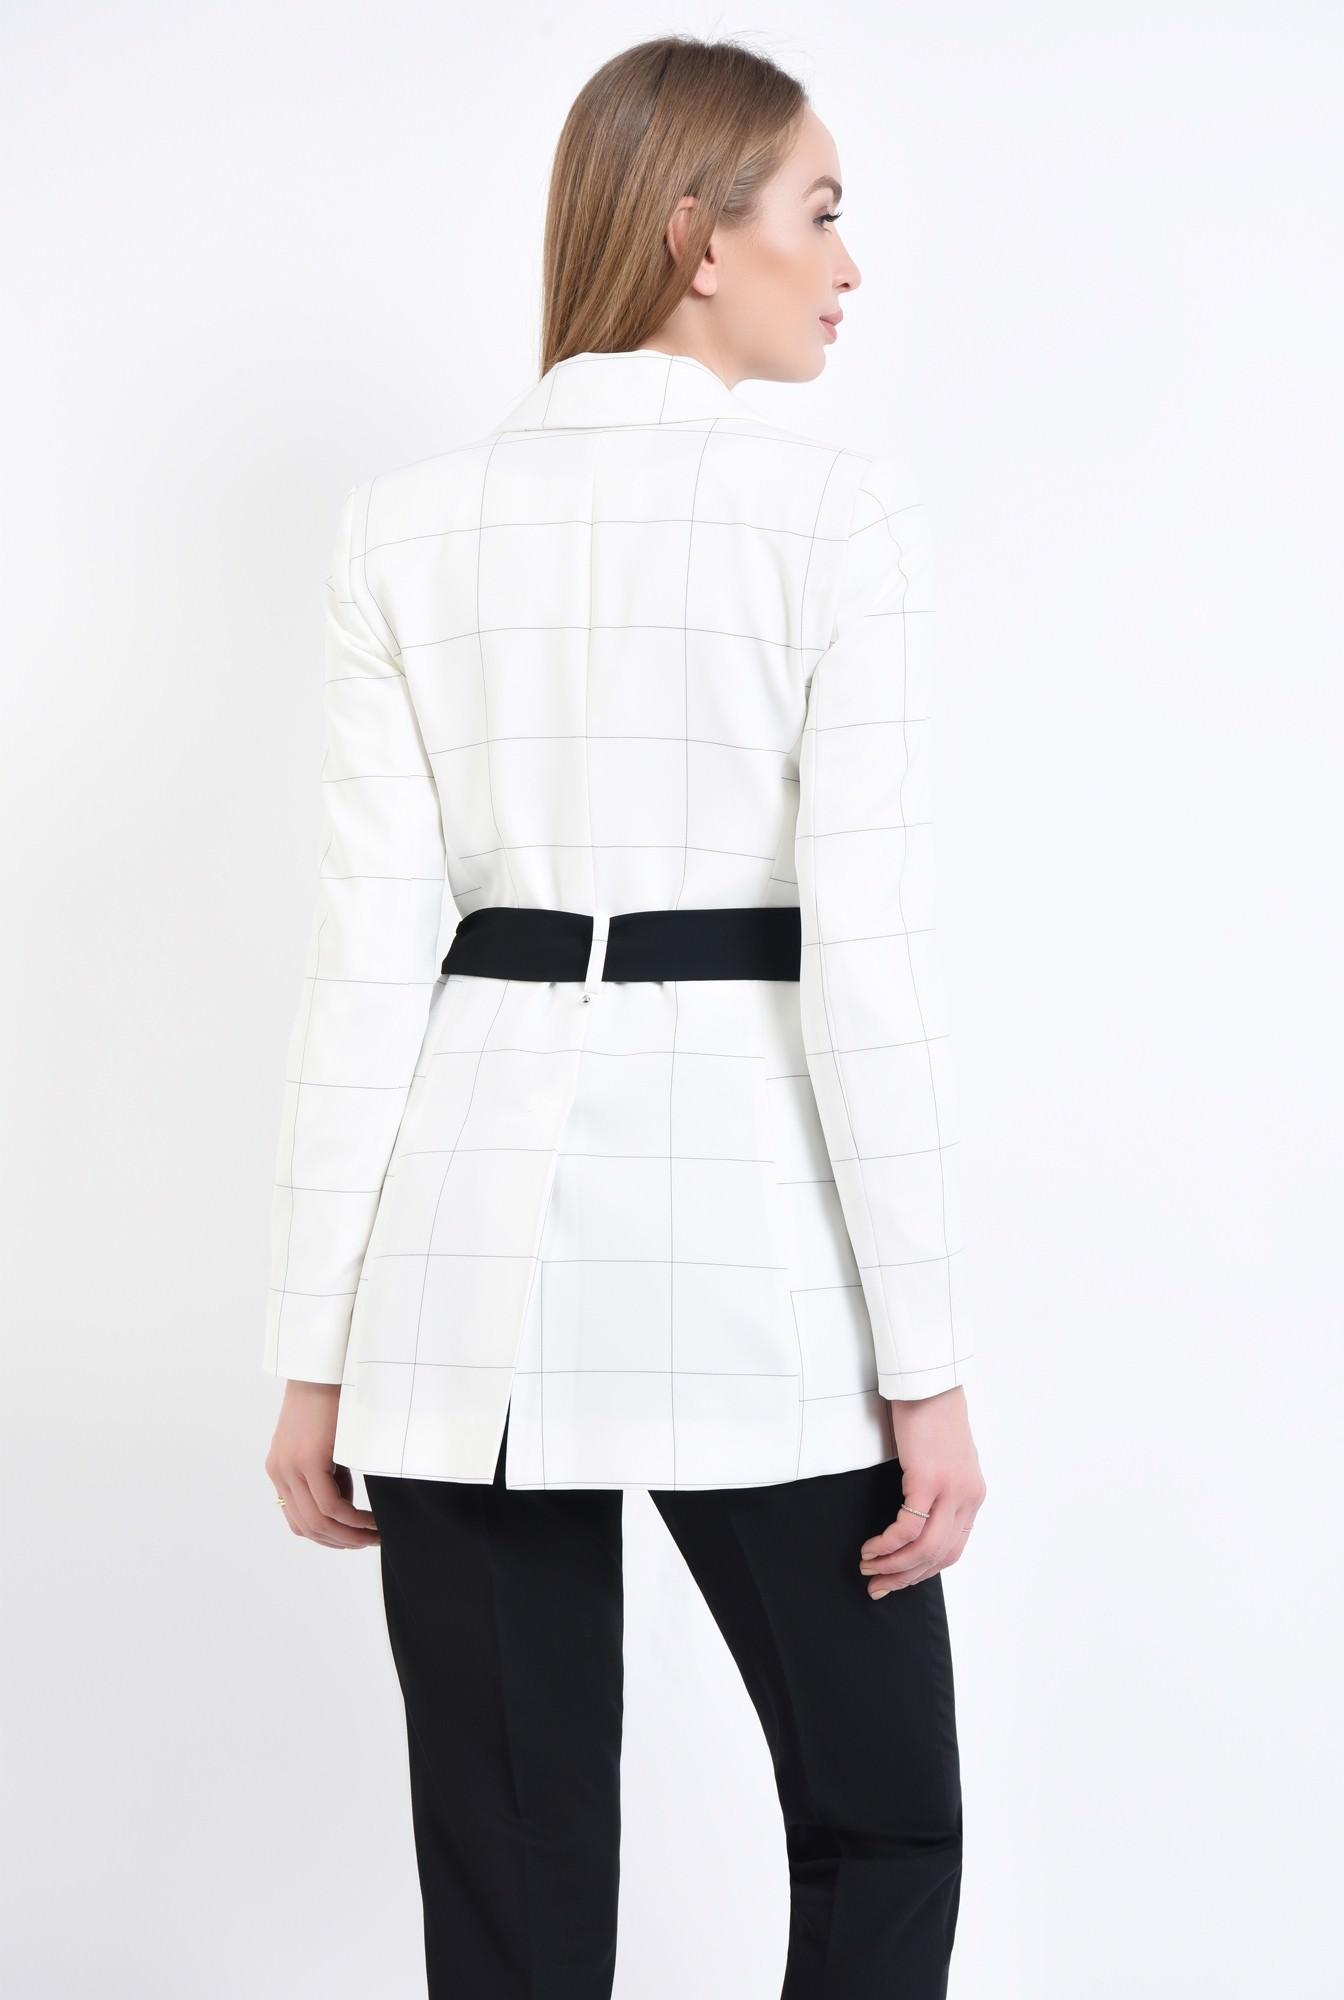 1 - Sacou elegant, alb